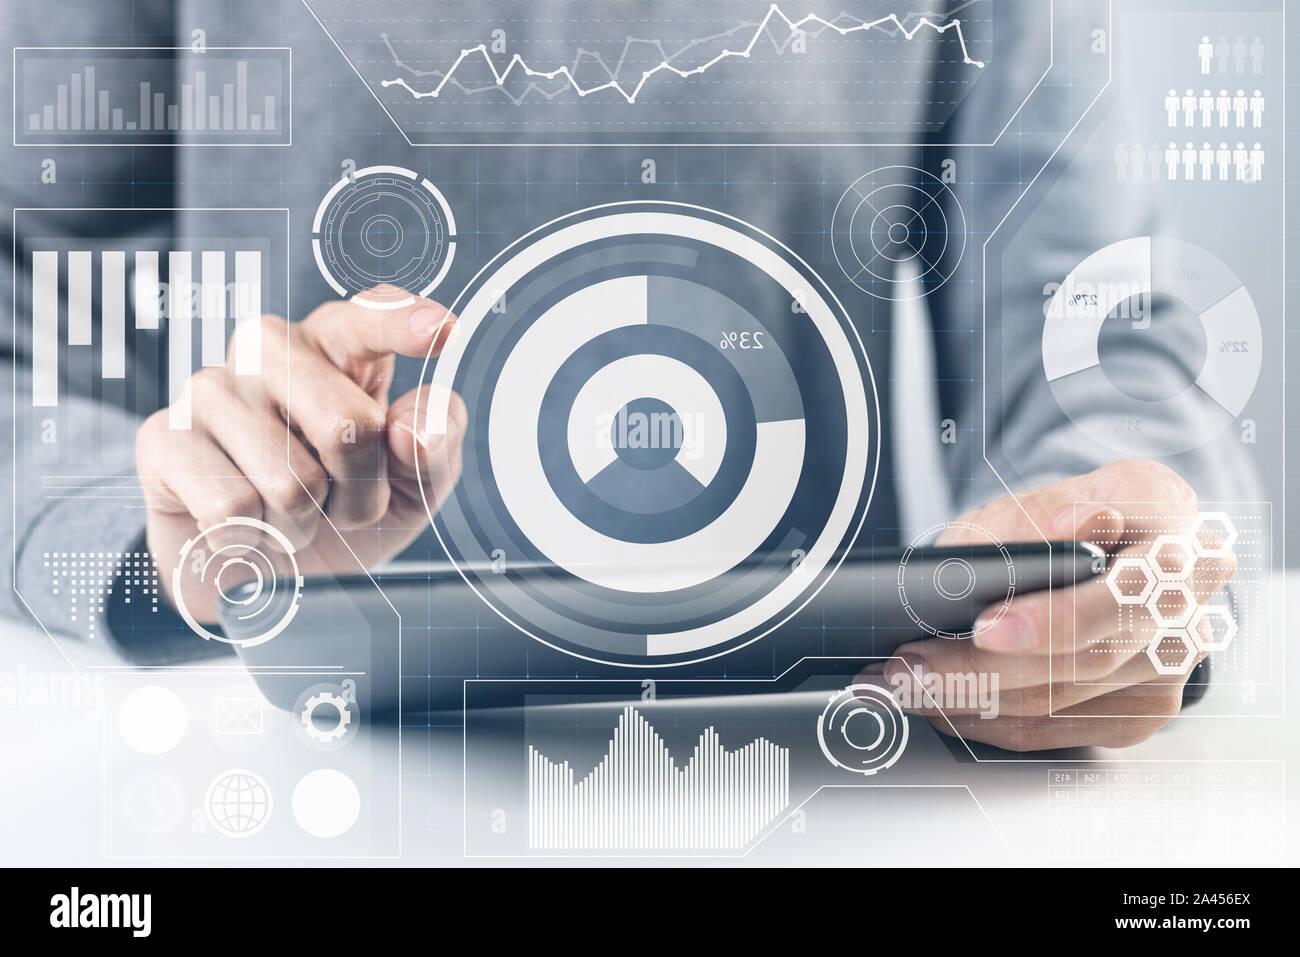 Börsenmakler mit finanzieller Informationen arbeiten Stockfoto